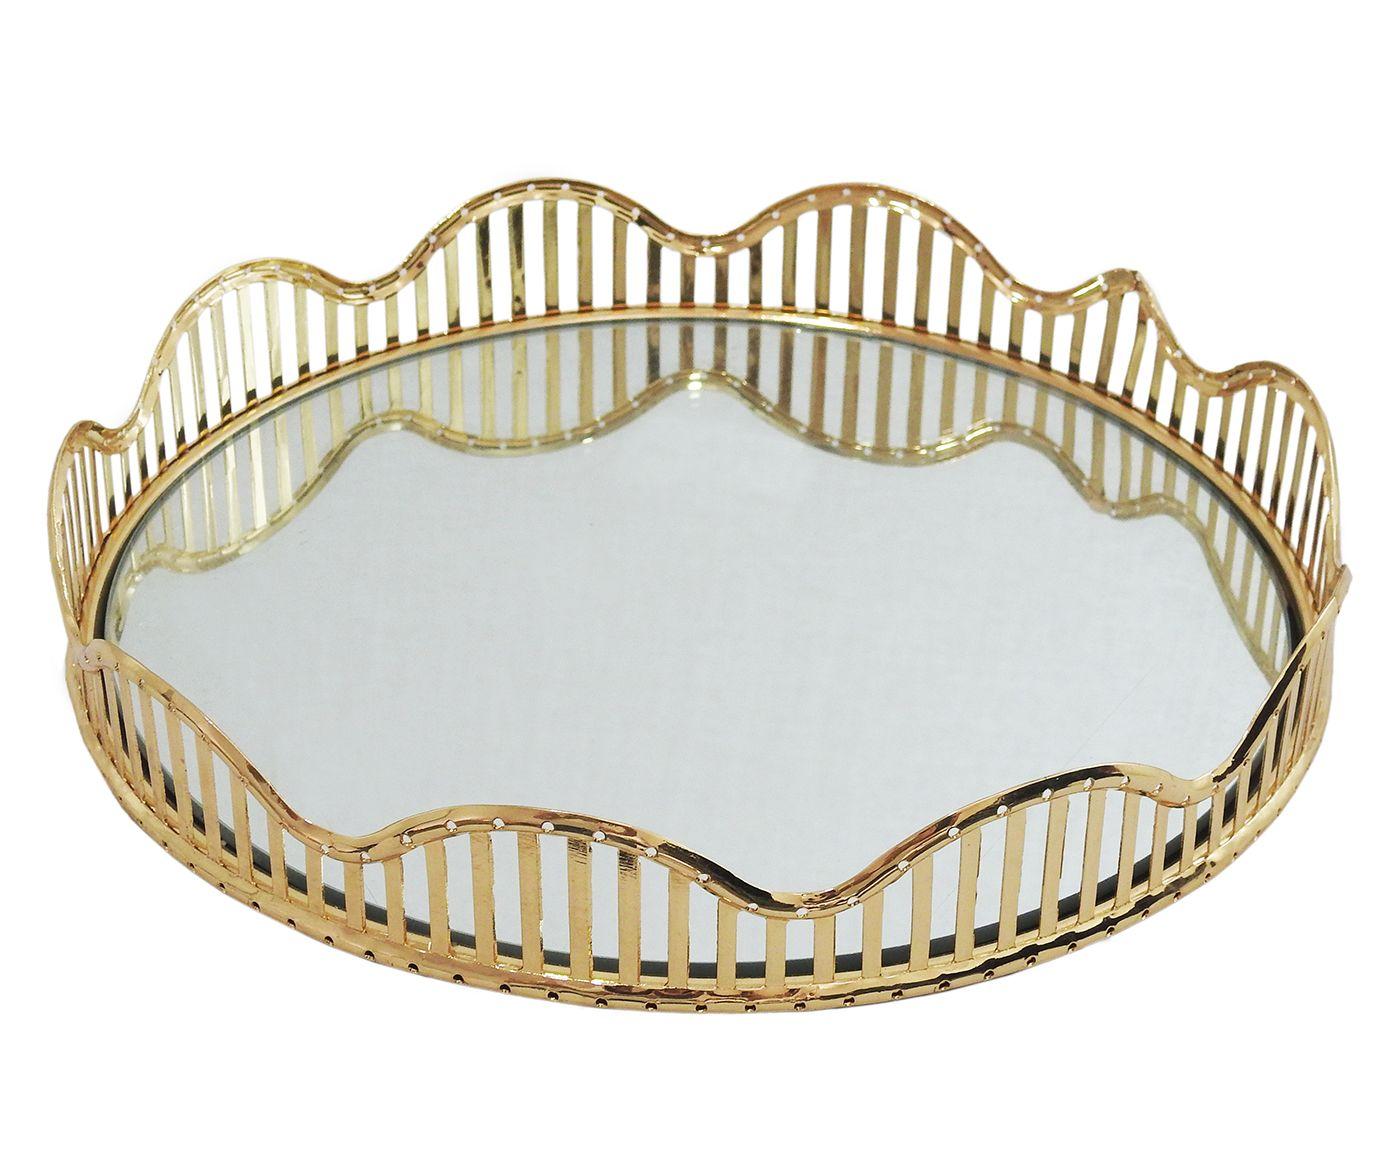 Bandeja Decorativa Jessie Dourada - 28cm | Westwing.com.br